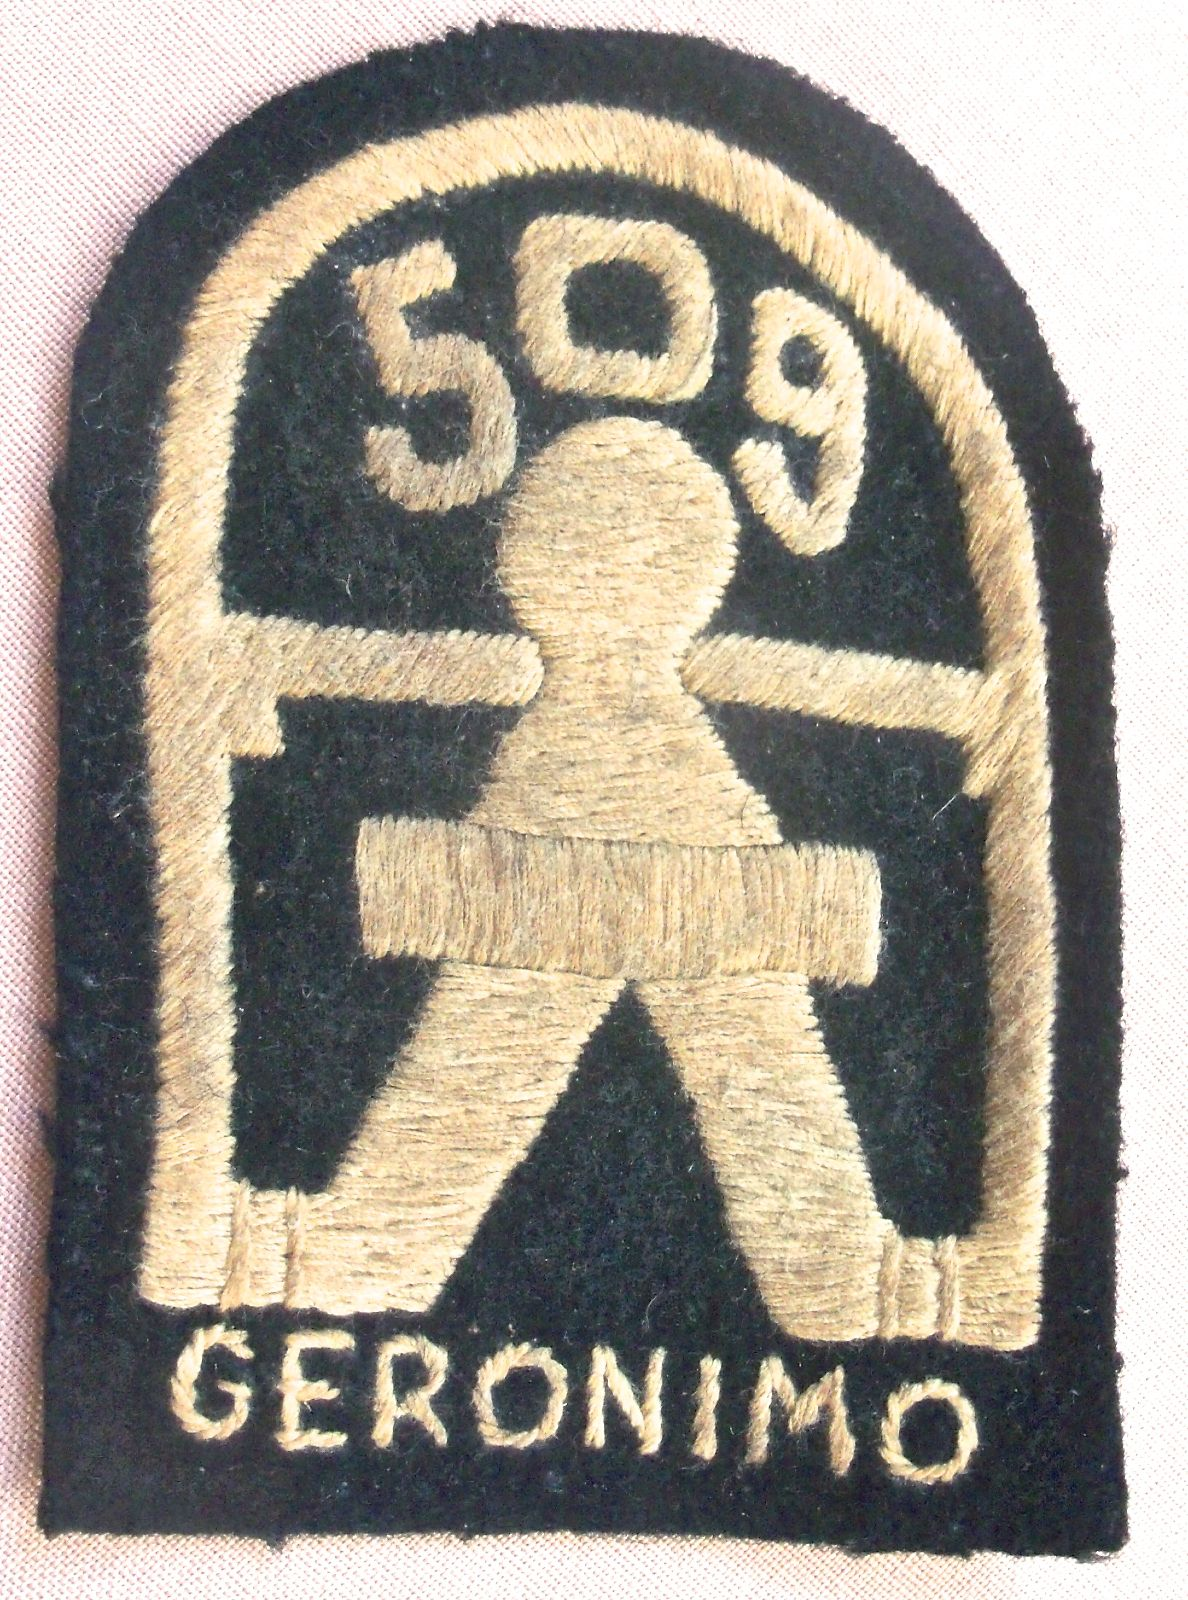 World War Ii Army Uniform Patch Identification - Year of Clean Water